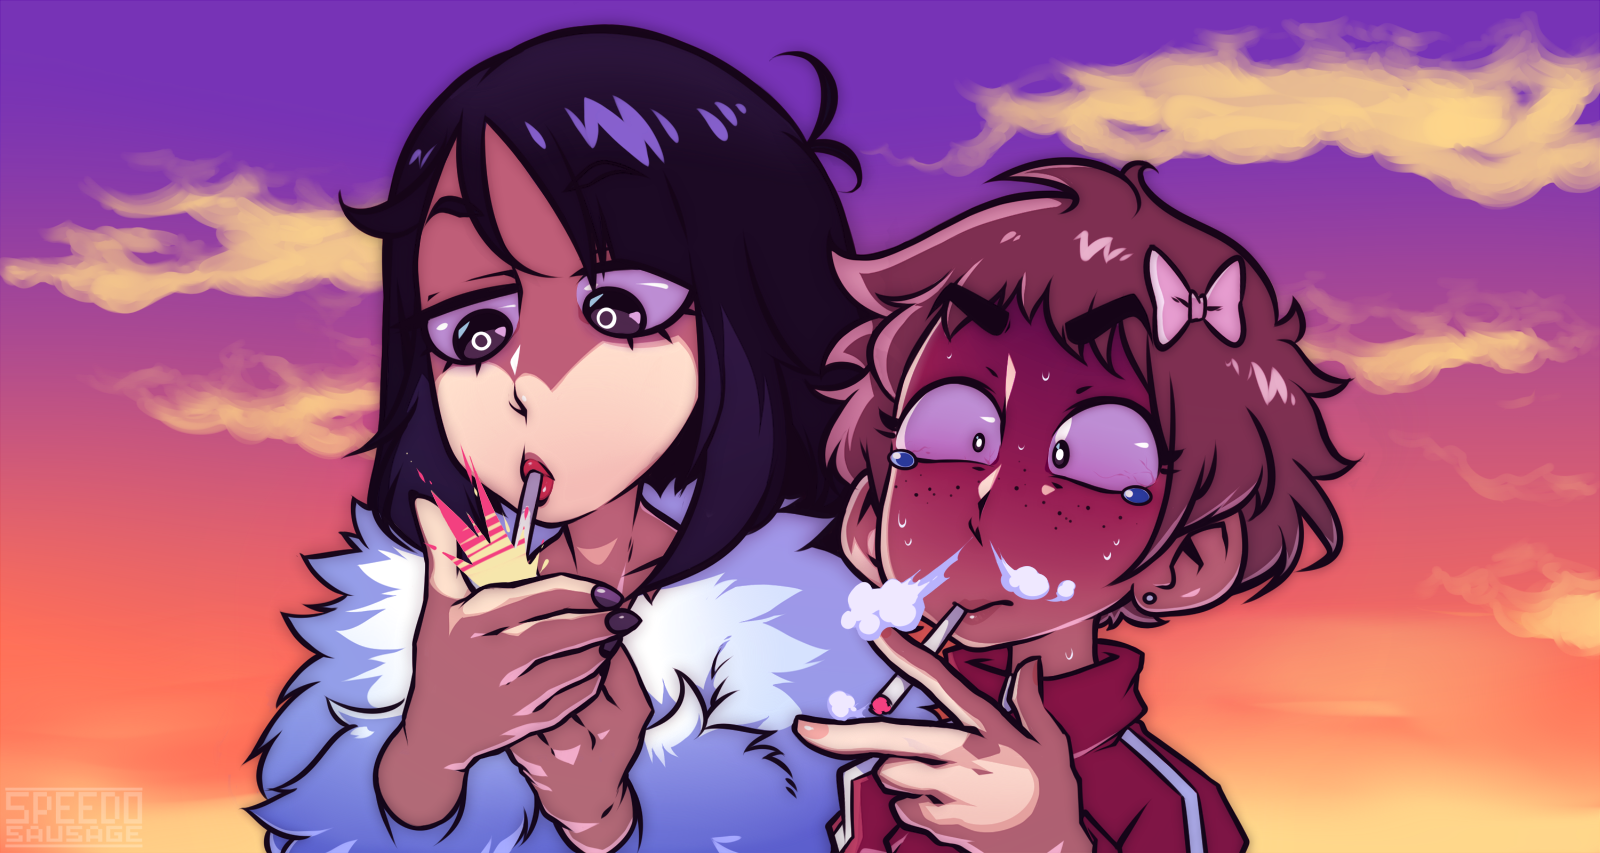 You smoke, right?